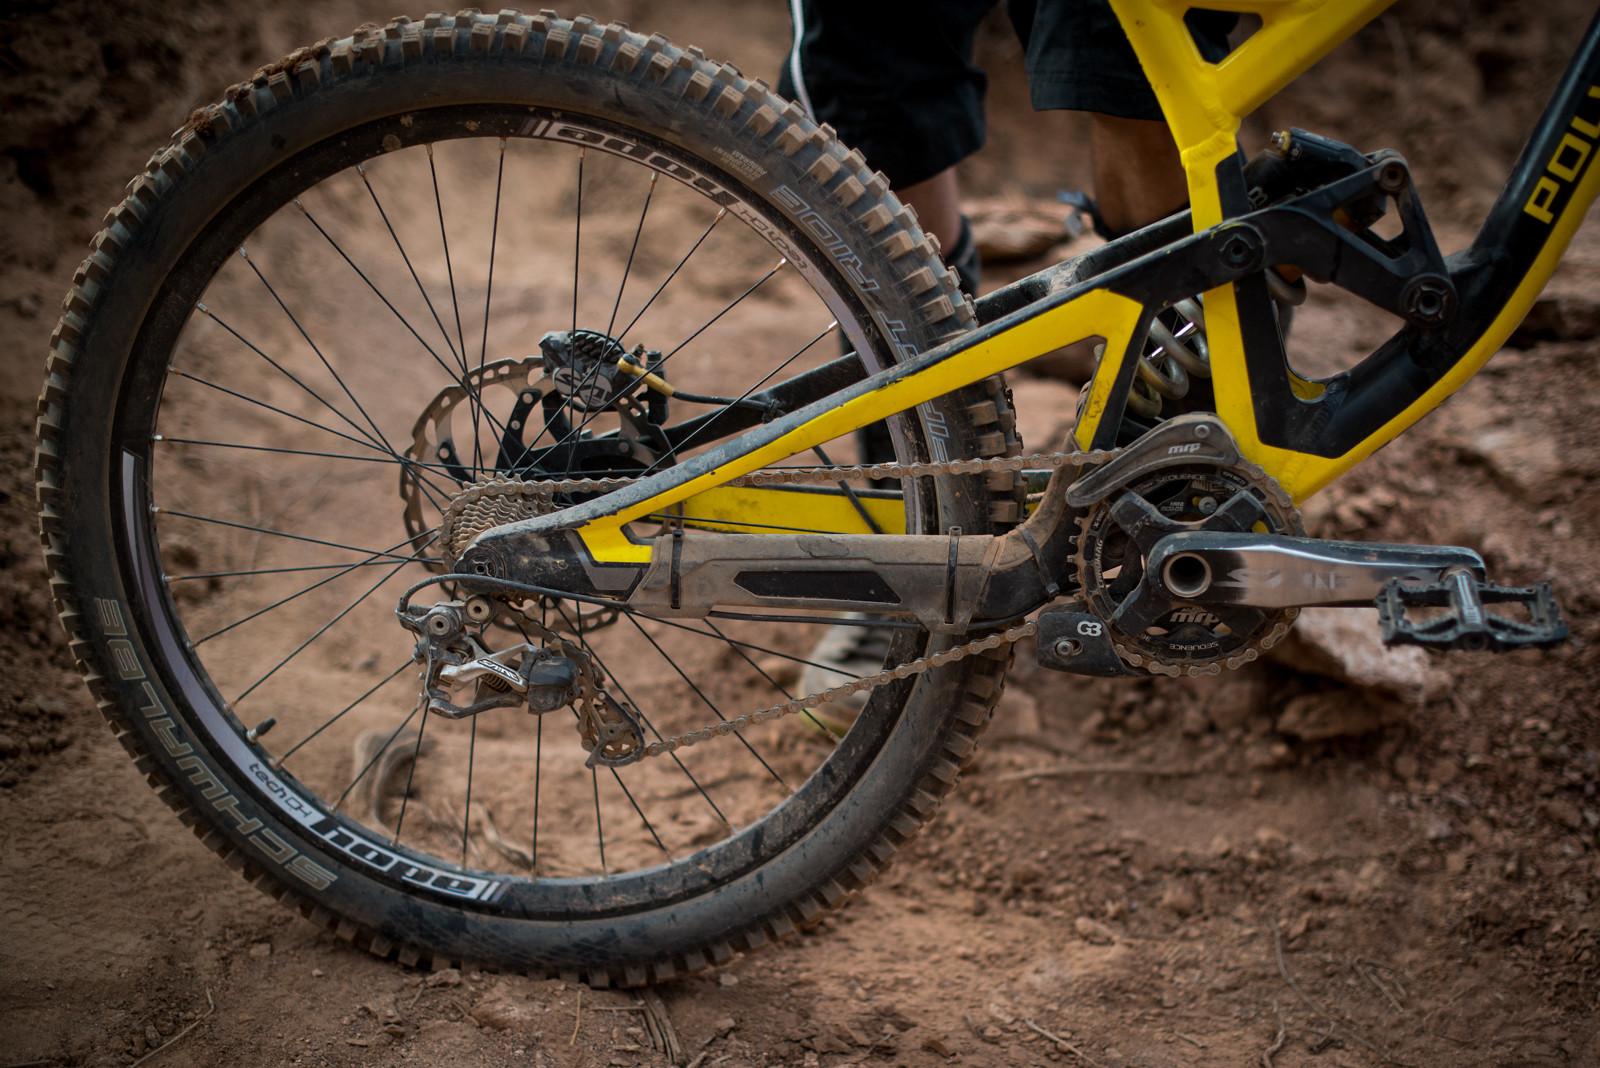 WINNING BIKE - Kurt Sorge's Polygon Collosus - FredLikesTrikes - Mountain Biking Pictures - Vital MTB